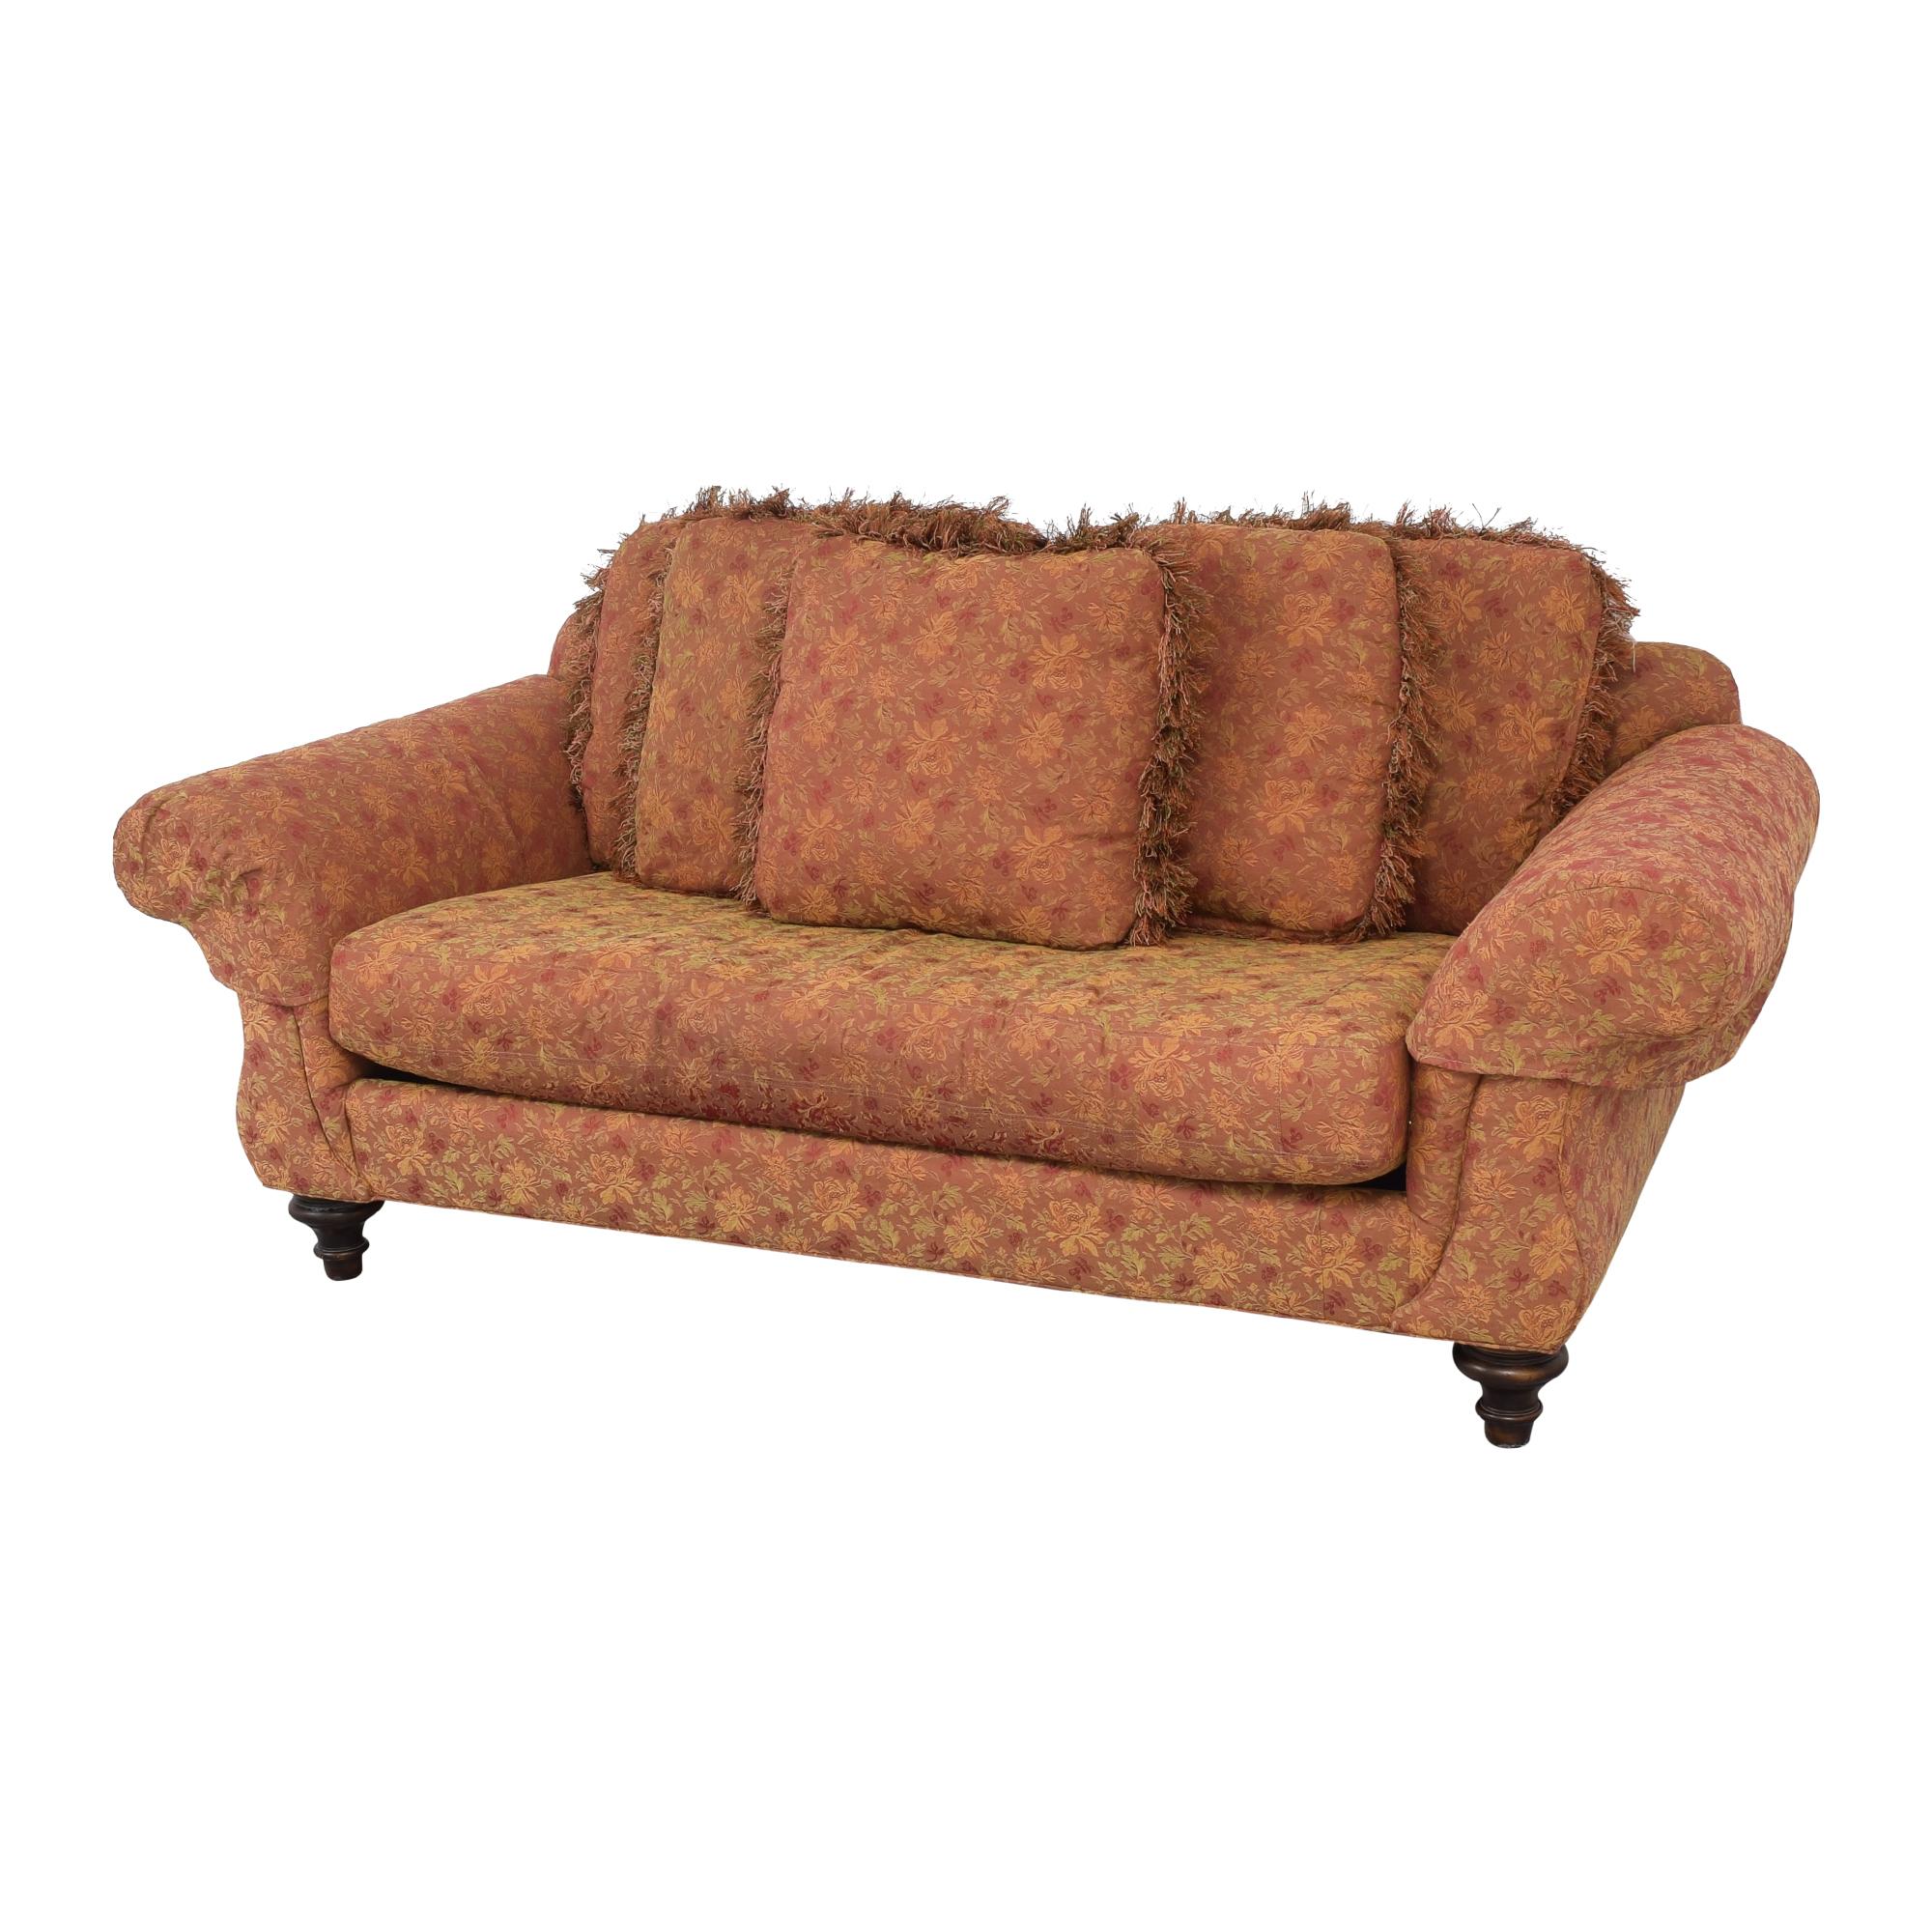 Vanguard Furniture Vanguard Single Cushion Sofa dimensions